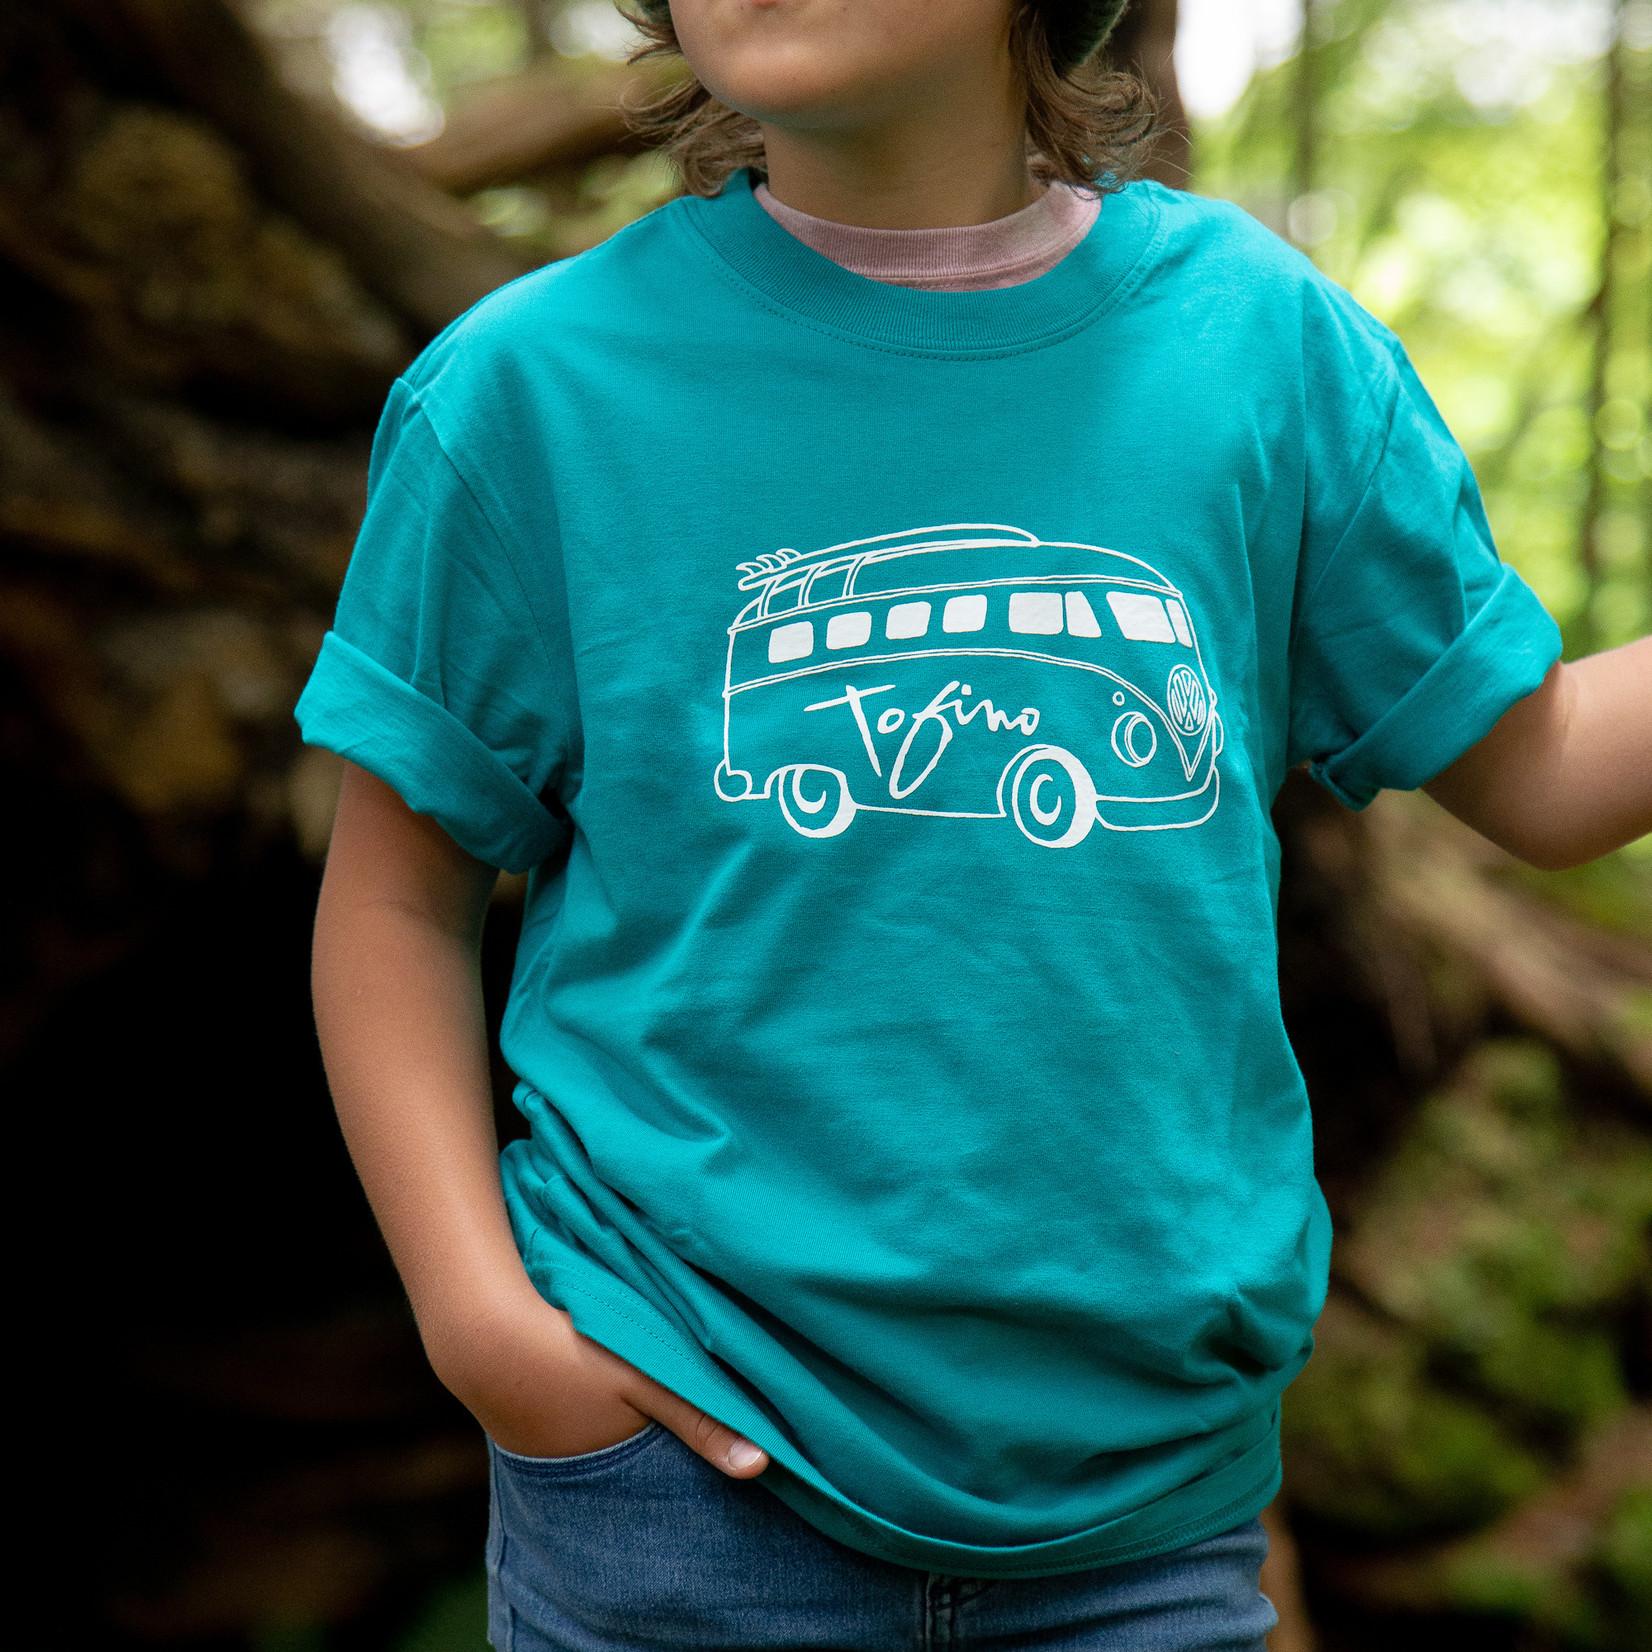 Tourism Tofino T-Shirt  Youth  Chestervan